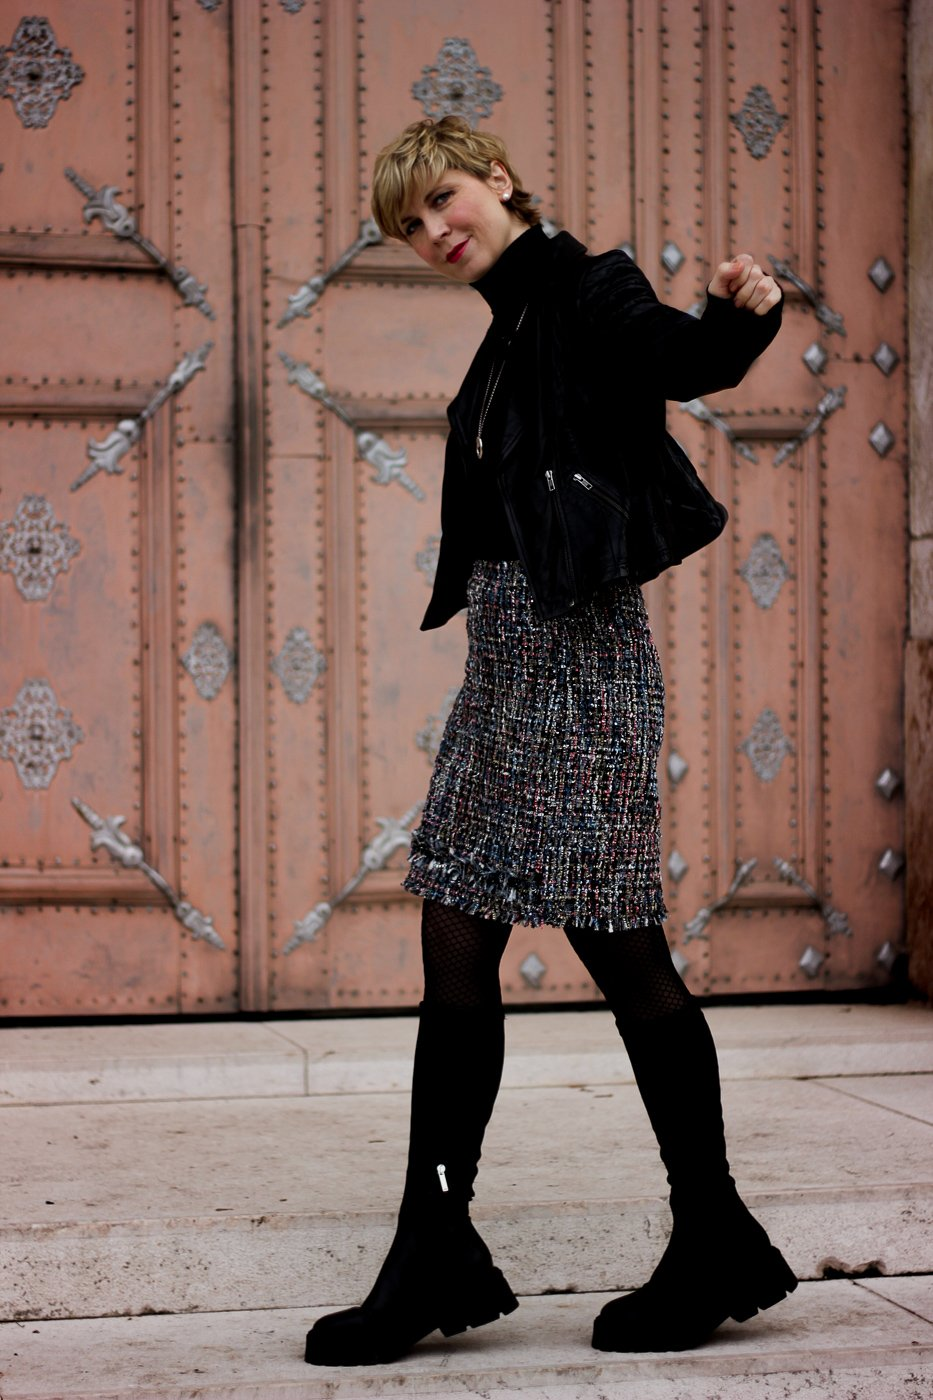 Conny doll lifestyle: Herbst/Winter-Styling, Boots, Lederjacke, Stilmix